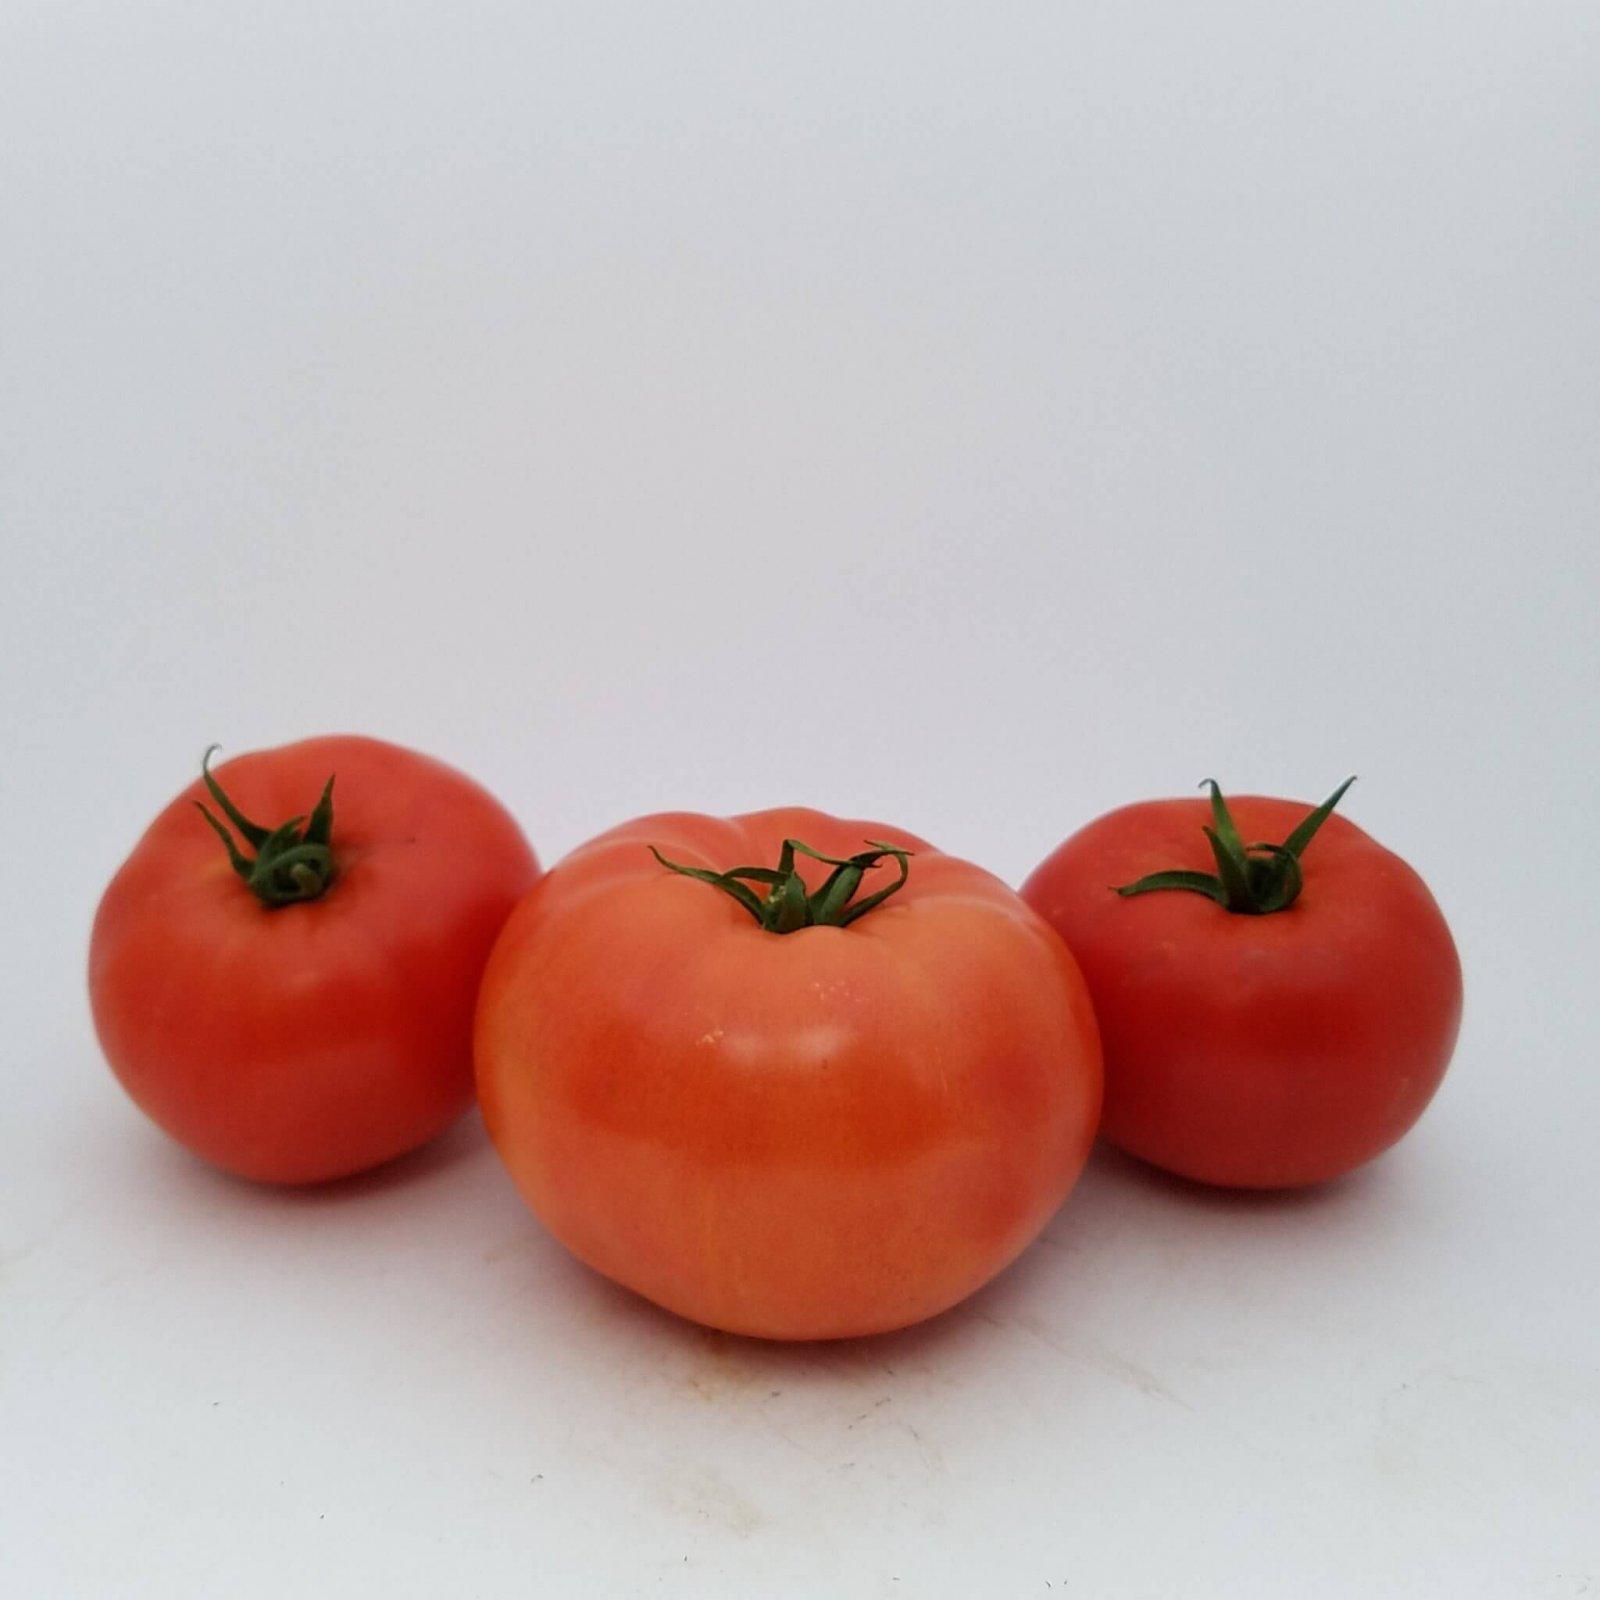 Bigdena Tomato - per pound Grown hydroponically